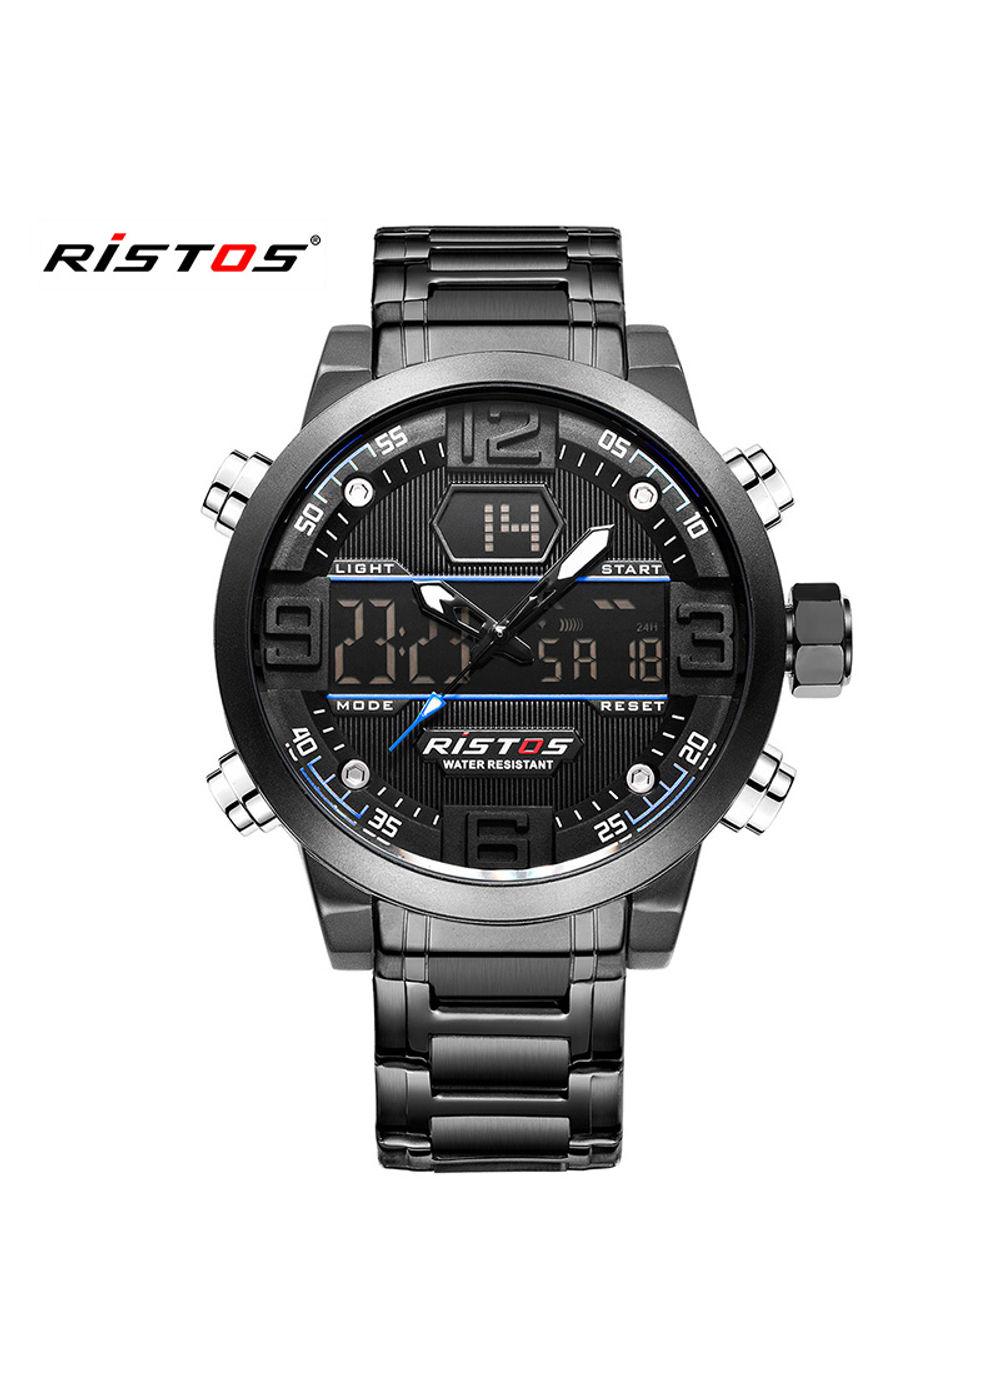 RISTOS-9338 Black Analog-Digital Chronograph Watch For-Men